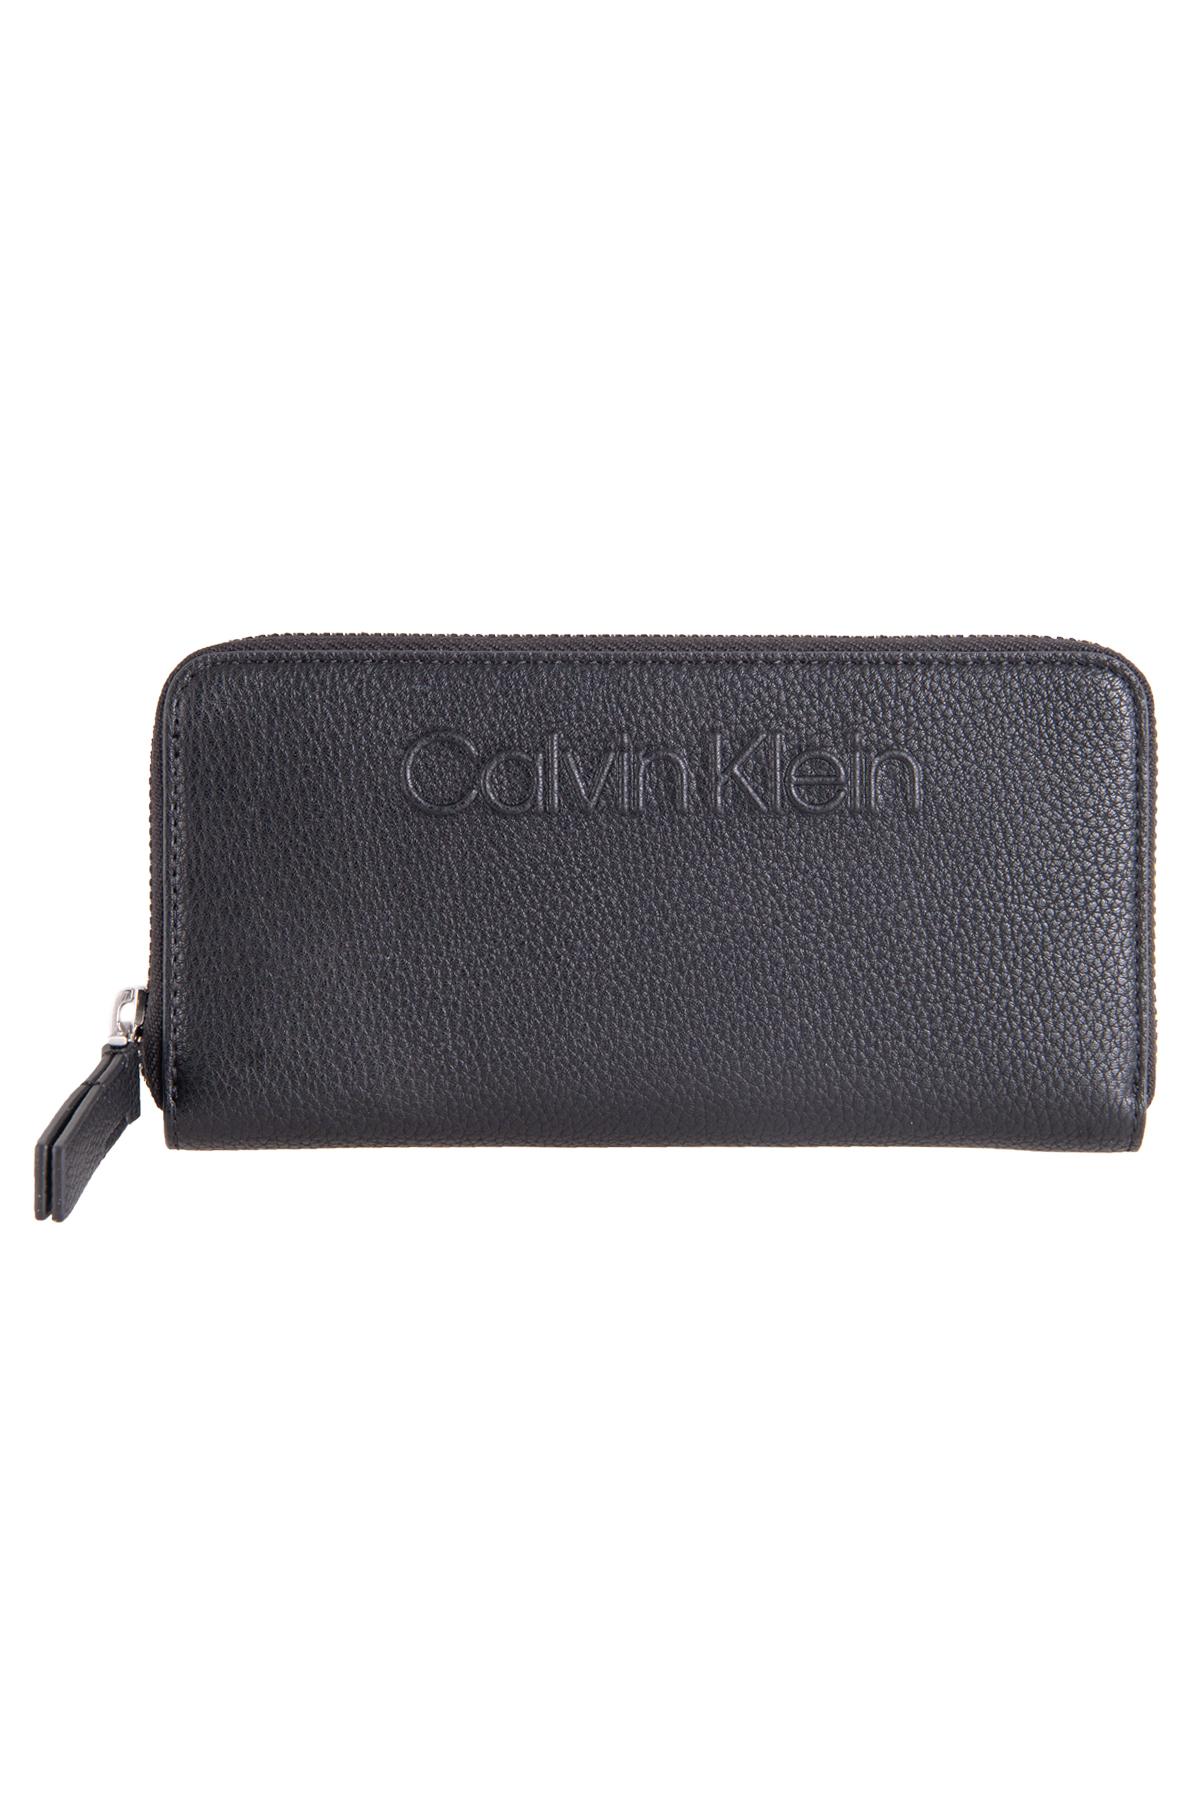 Calvin Klein  Bayan Cüzdan Siyah (ZW0ZW01014)